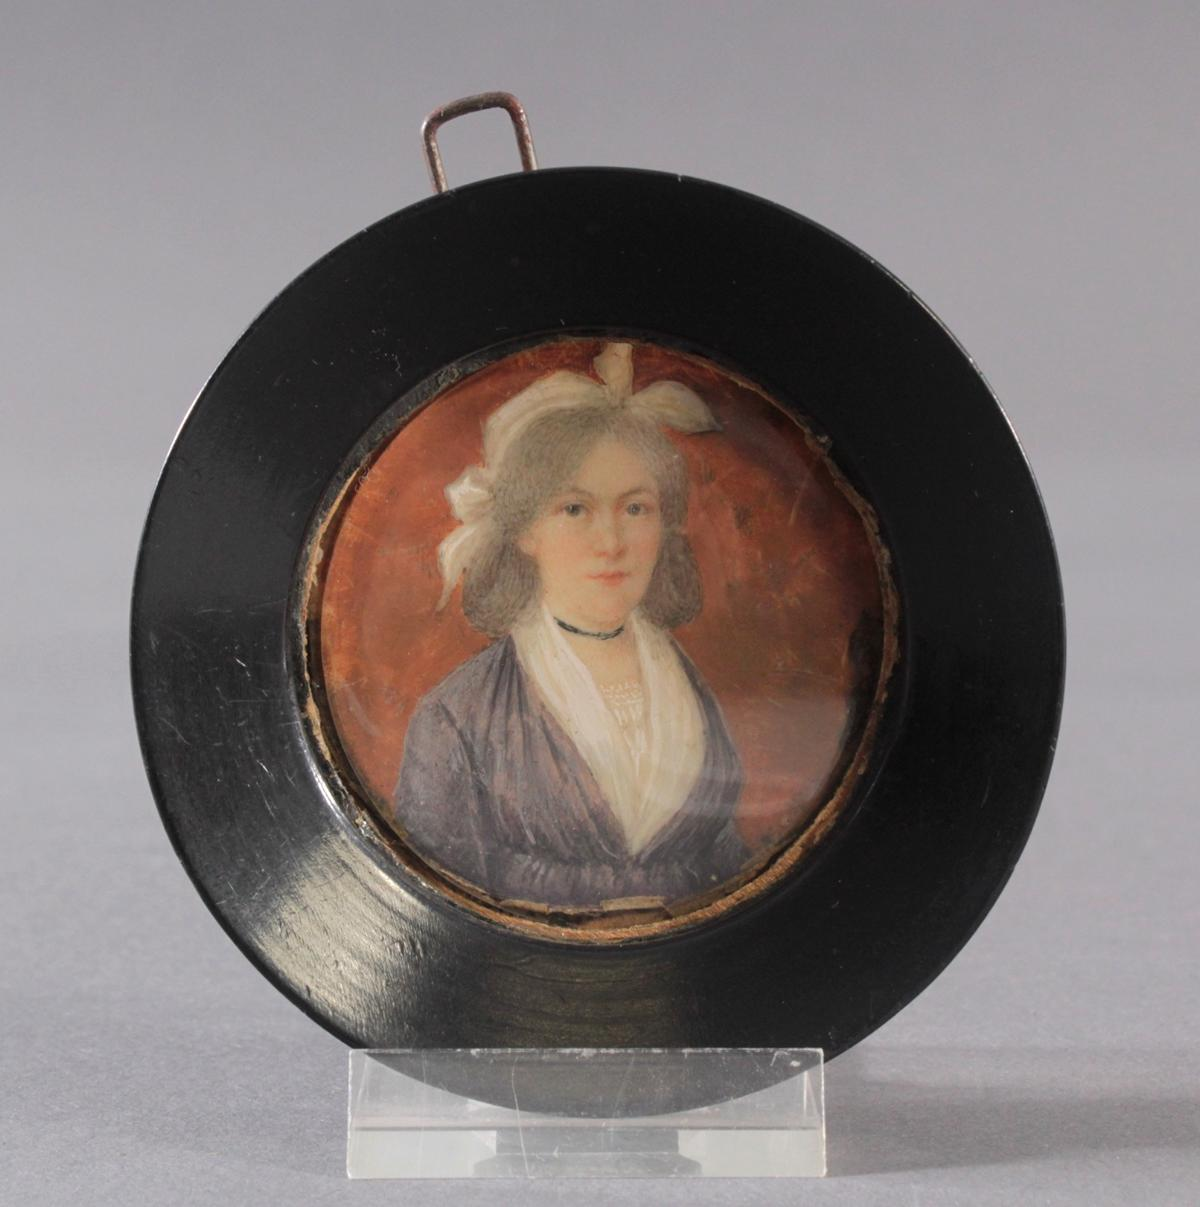 Biedermaier-Miniaturportrait, 1. Hälfte 19. Jh.